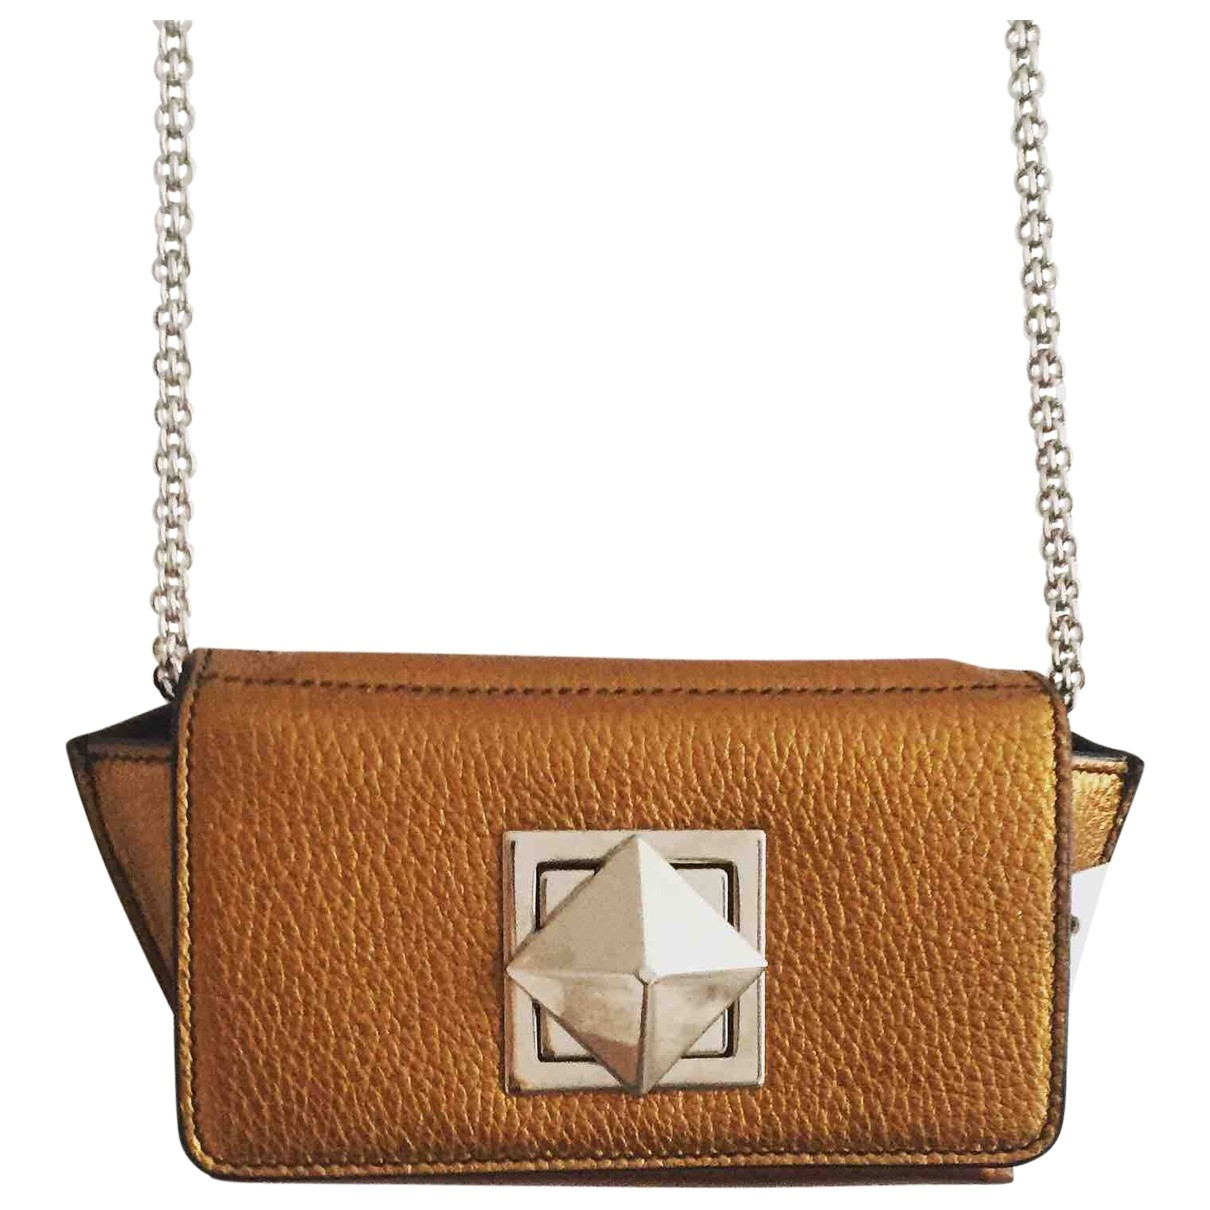 Sonia Rykiel Copain Gold Leather handbag for Women \N